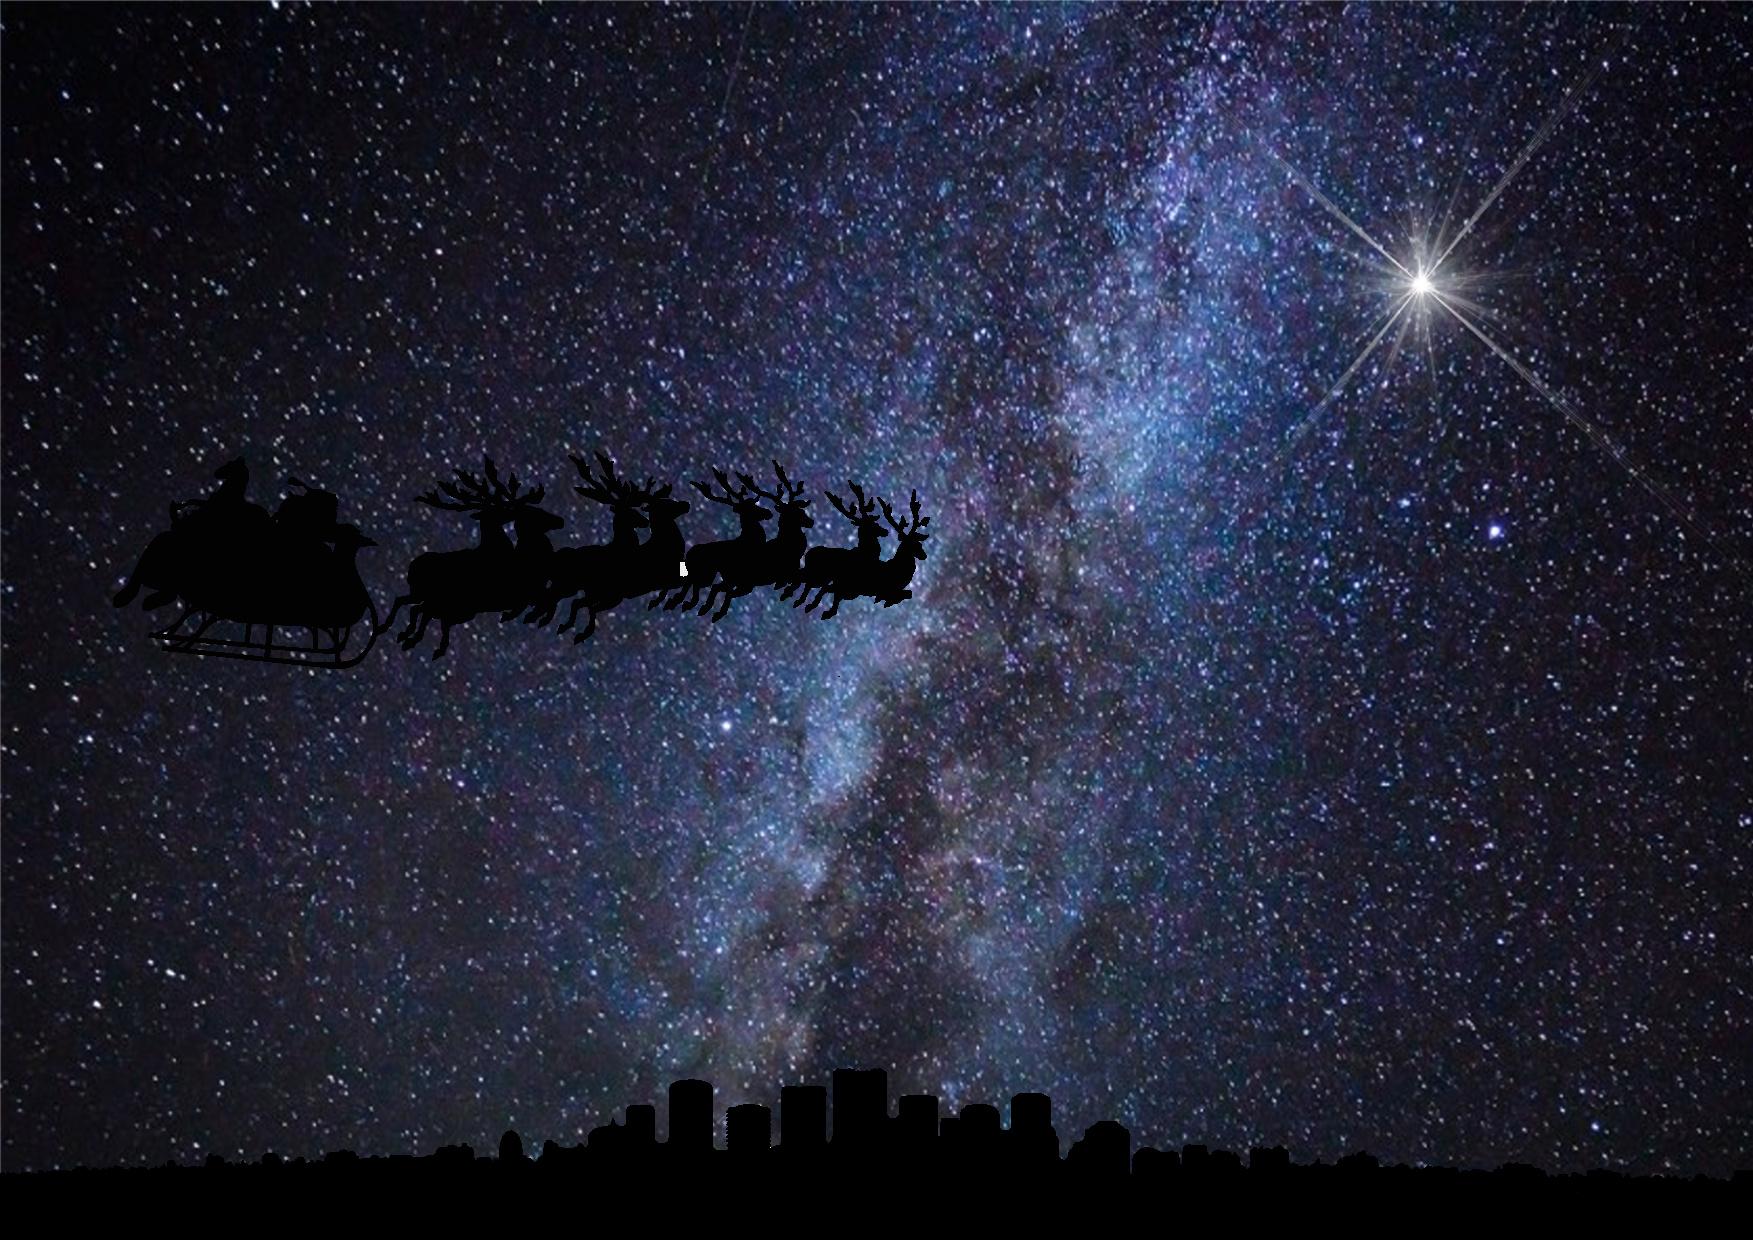 Christmas Silhouettes Sleigh.